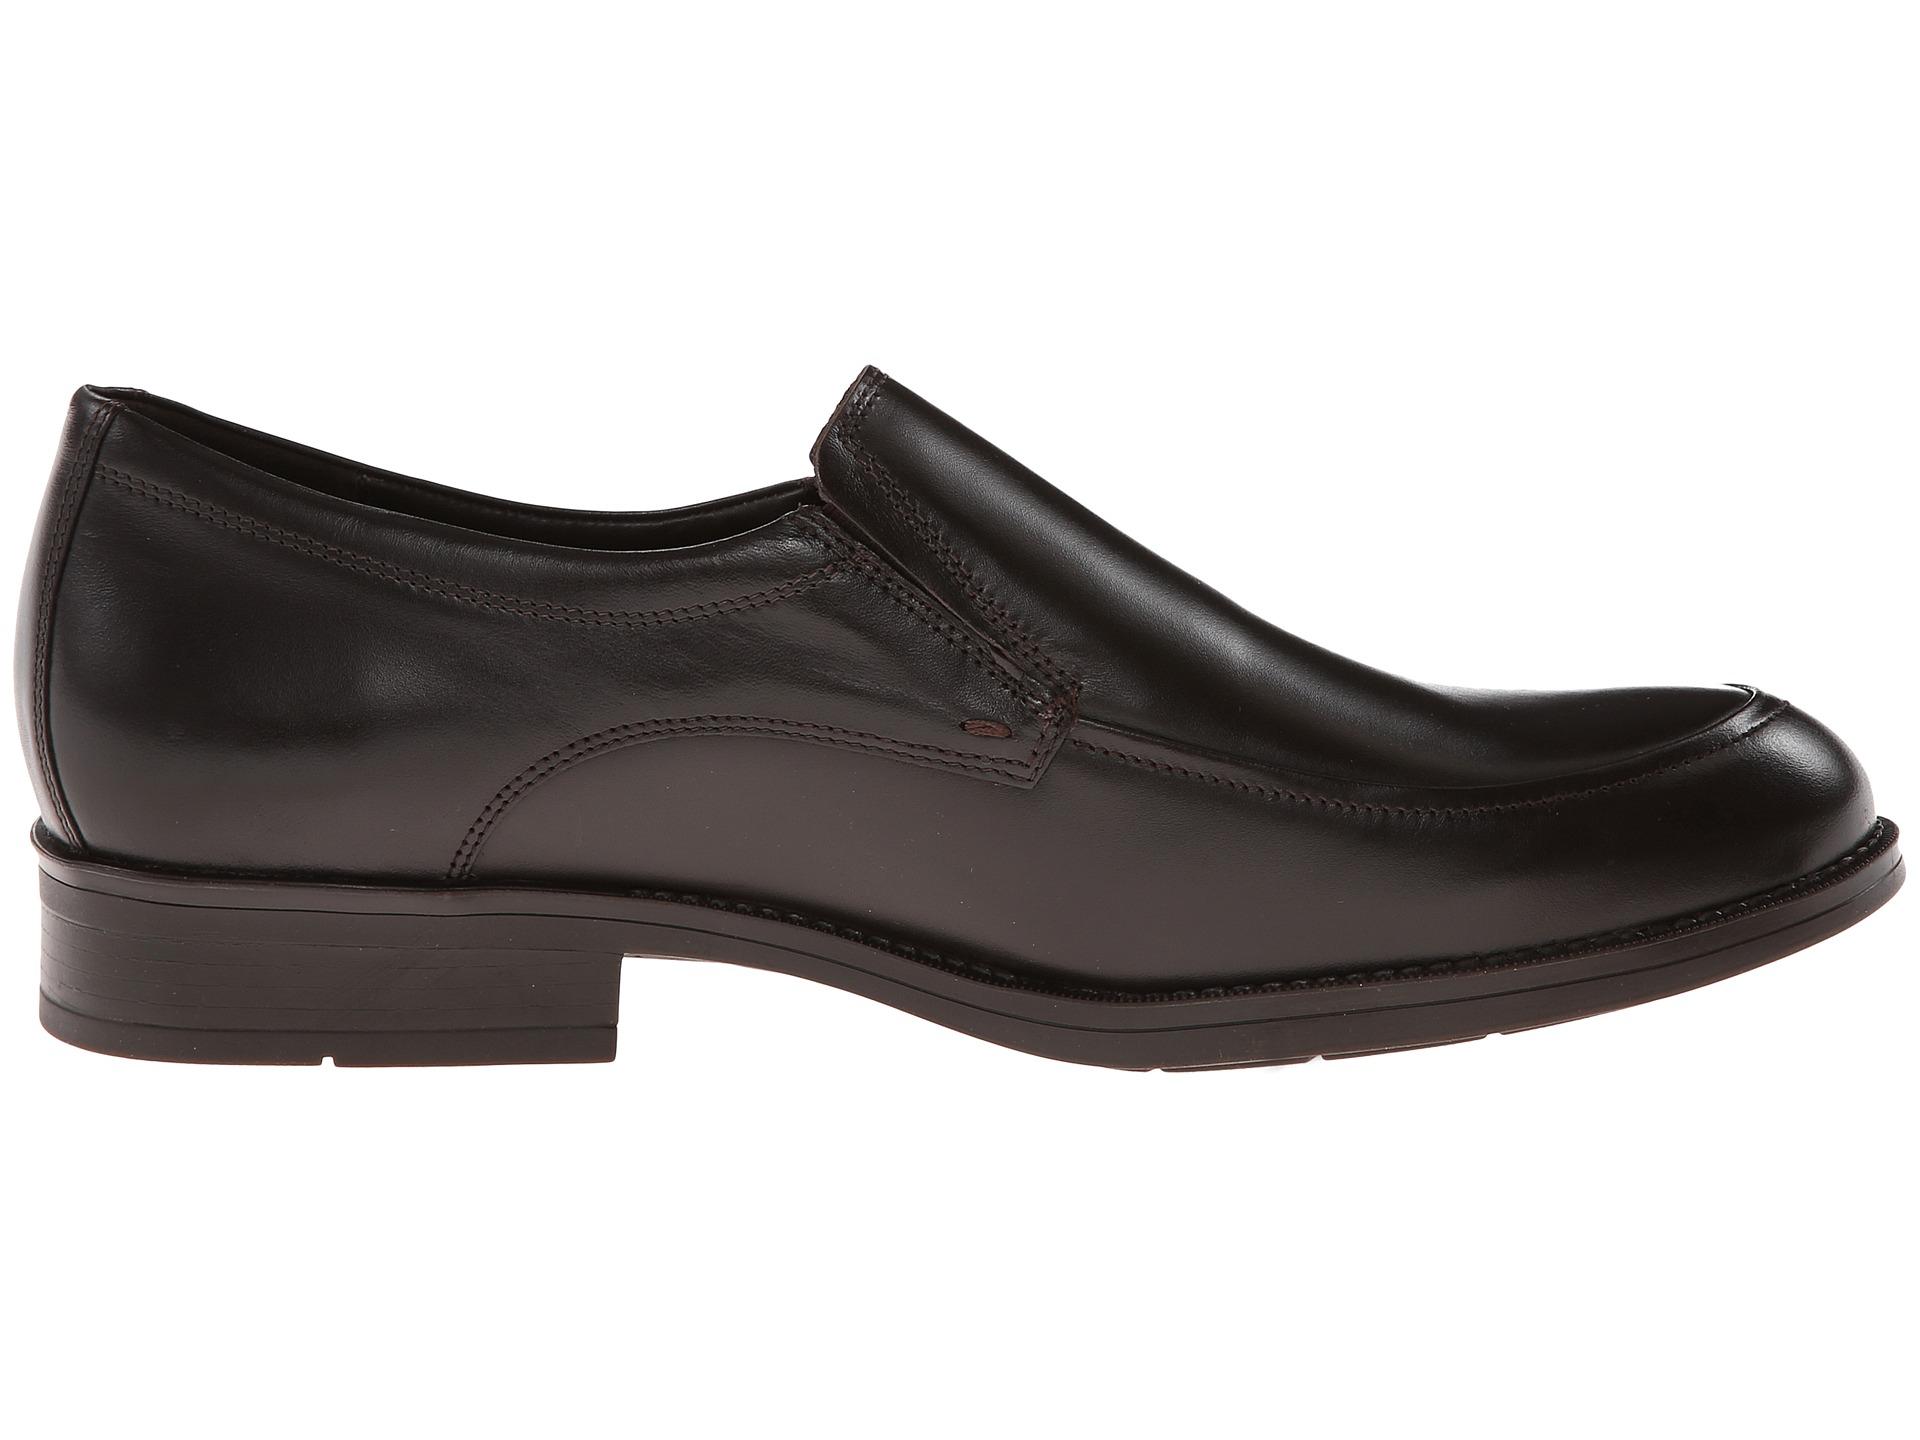 Mephisto Shoes New York